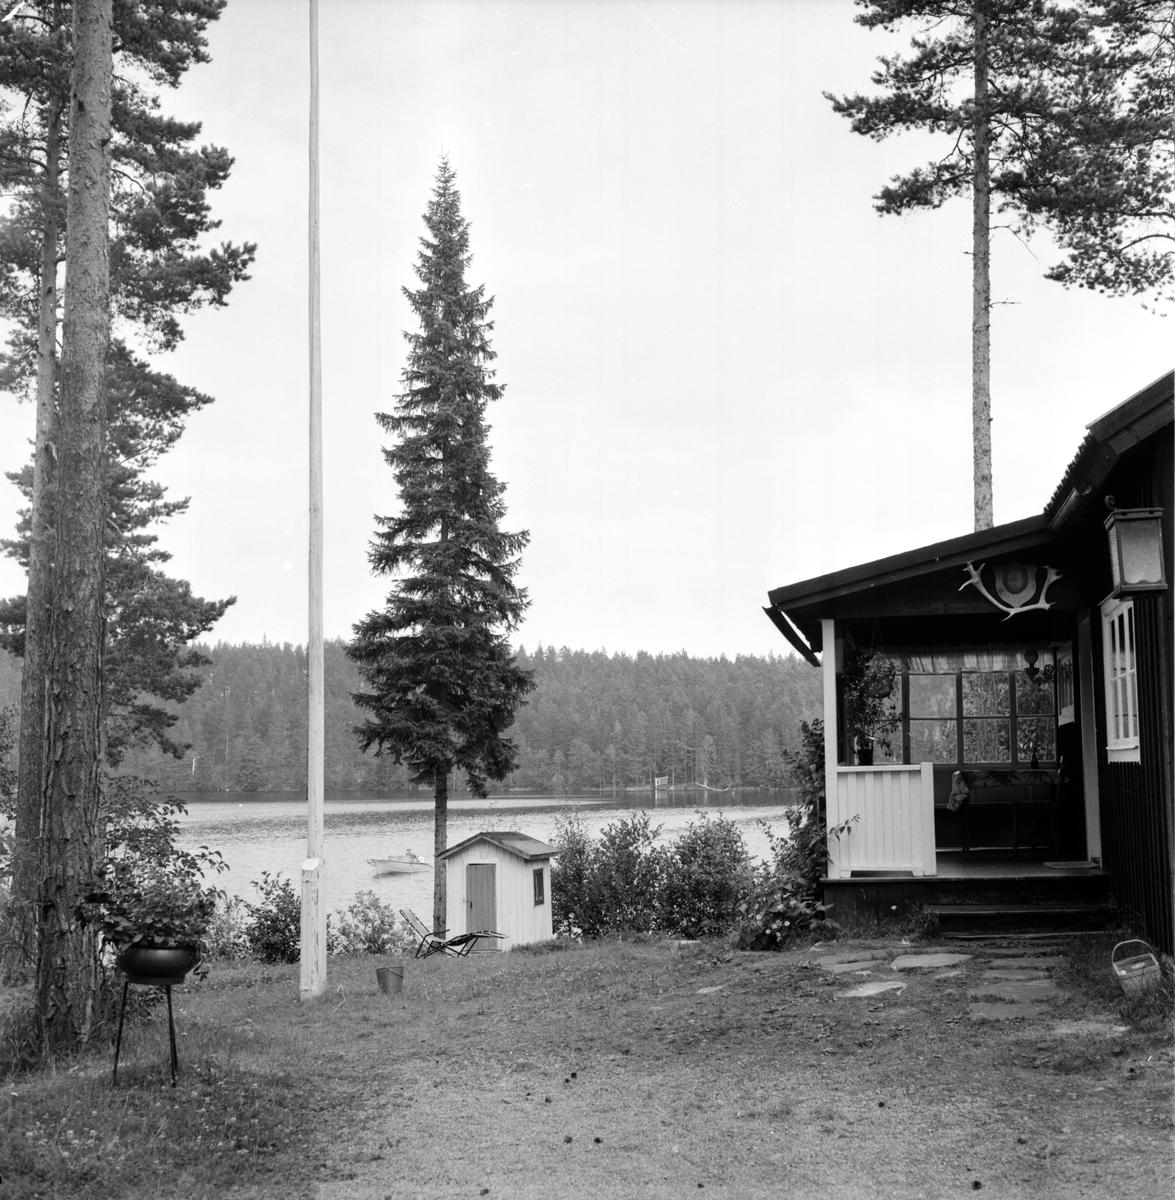 Ovanåker, Rotenonbehandling av Nyasen, 11 Augusti 1964